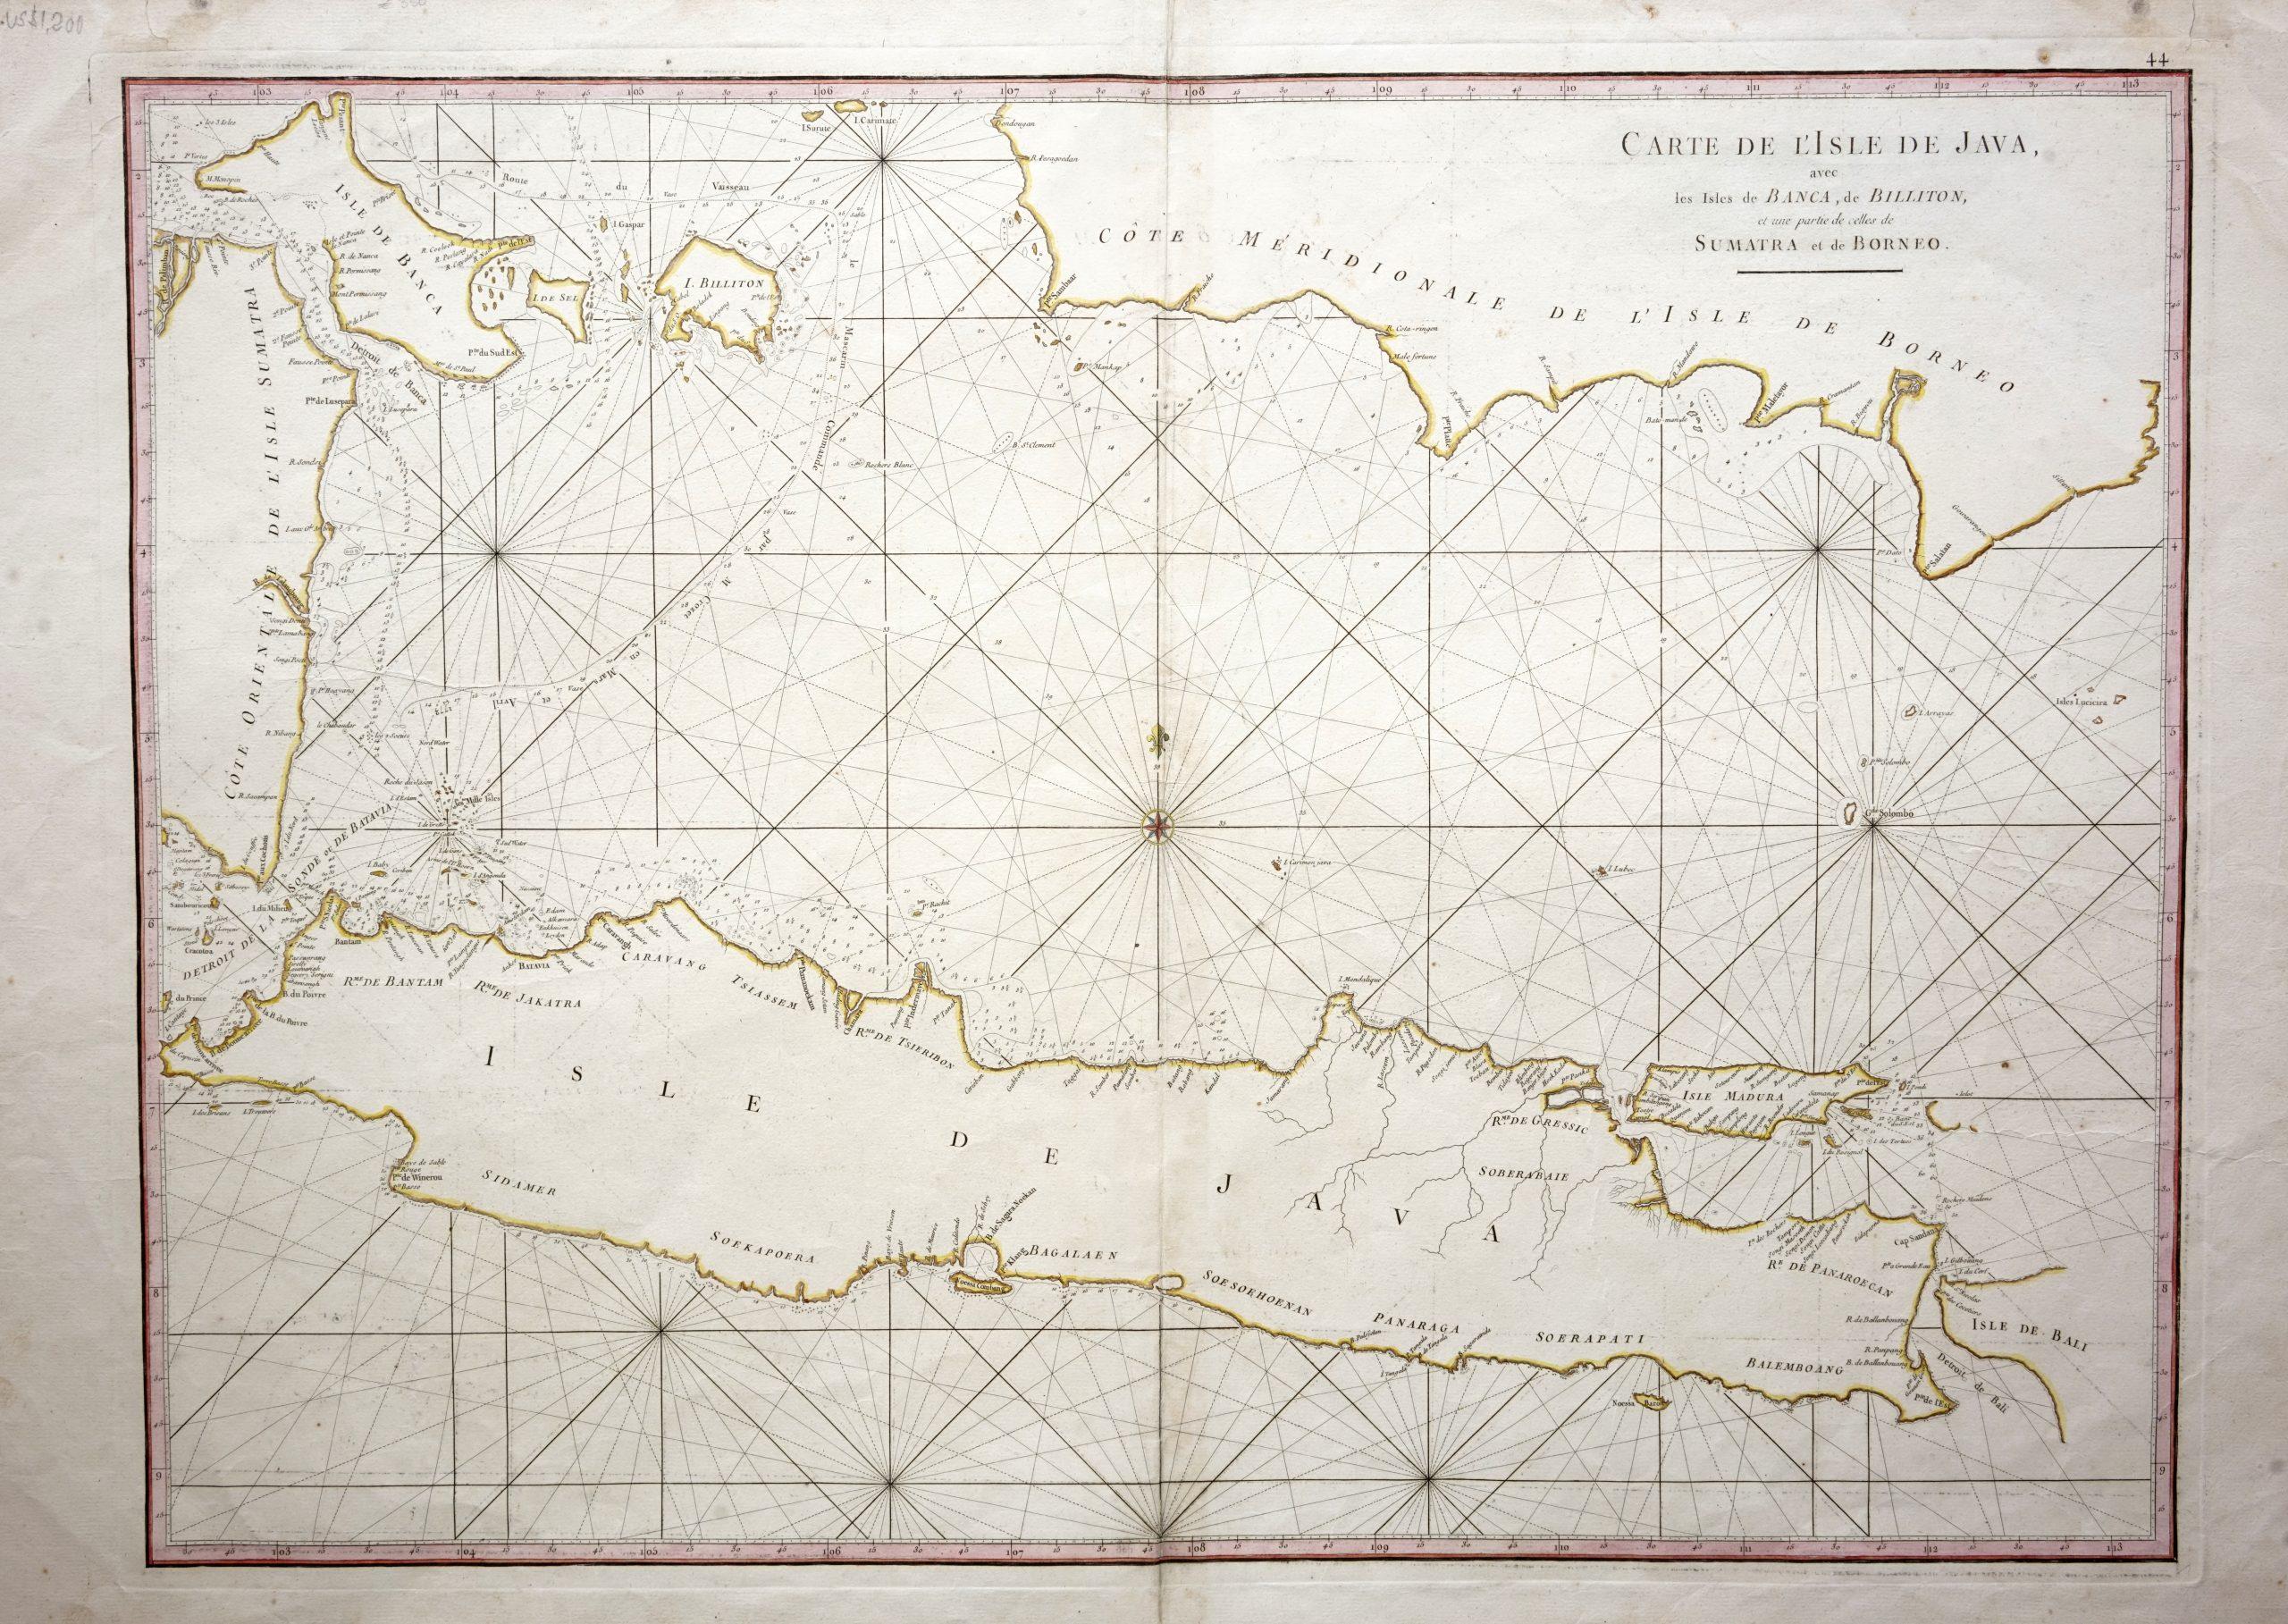 Sea Chart of Java Island - Mannevillette (c.1745)